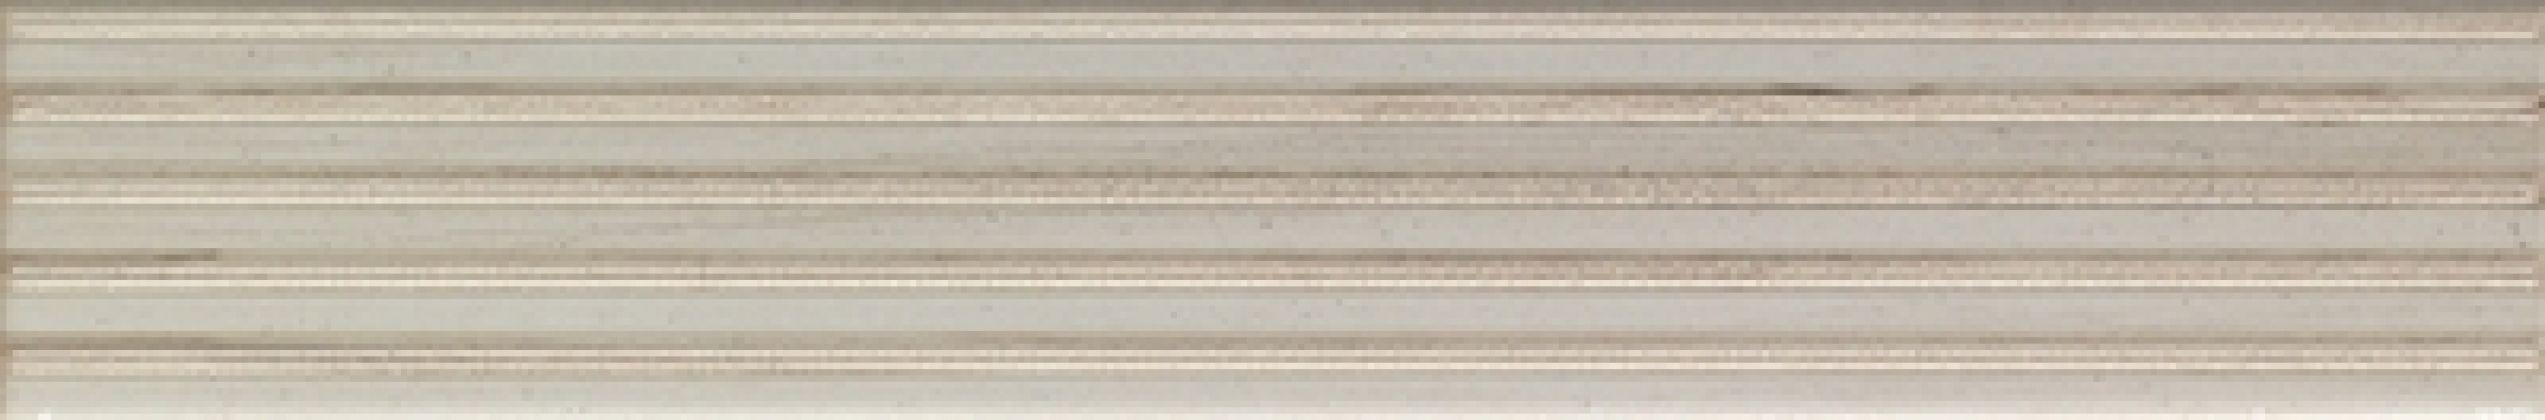 Lines Border Pearl 10x60